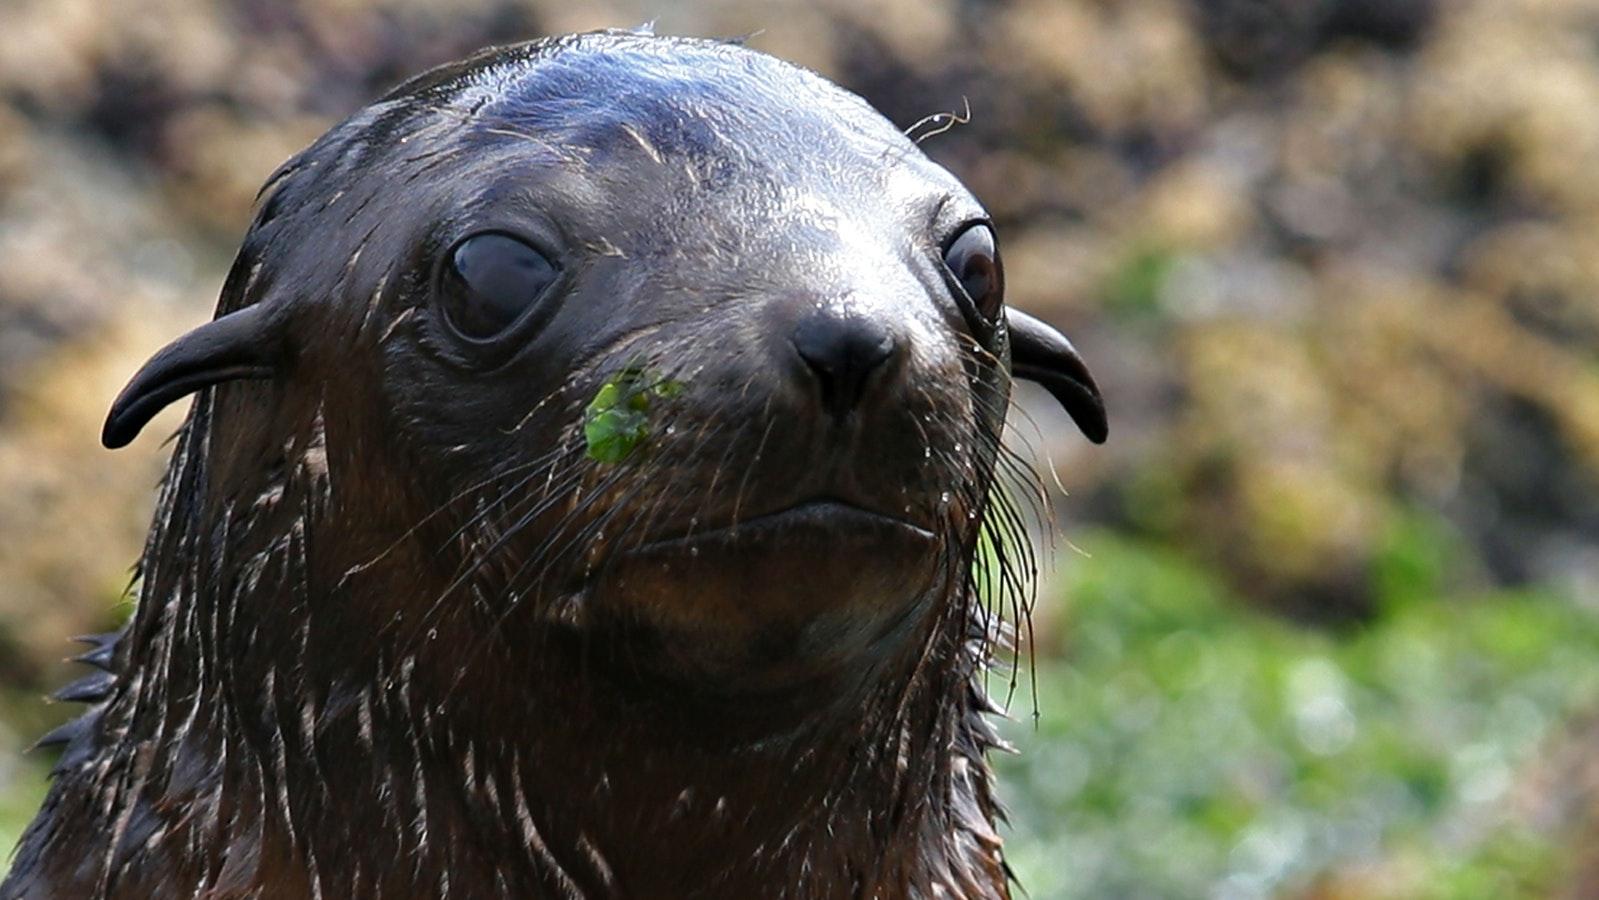 Seal pup up close!